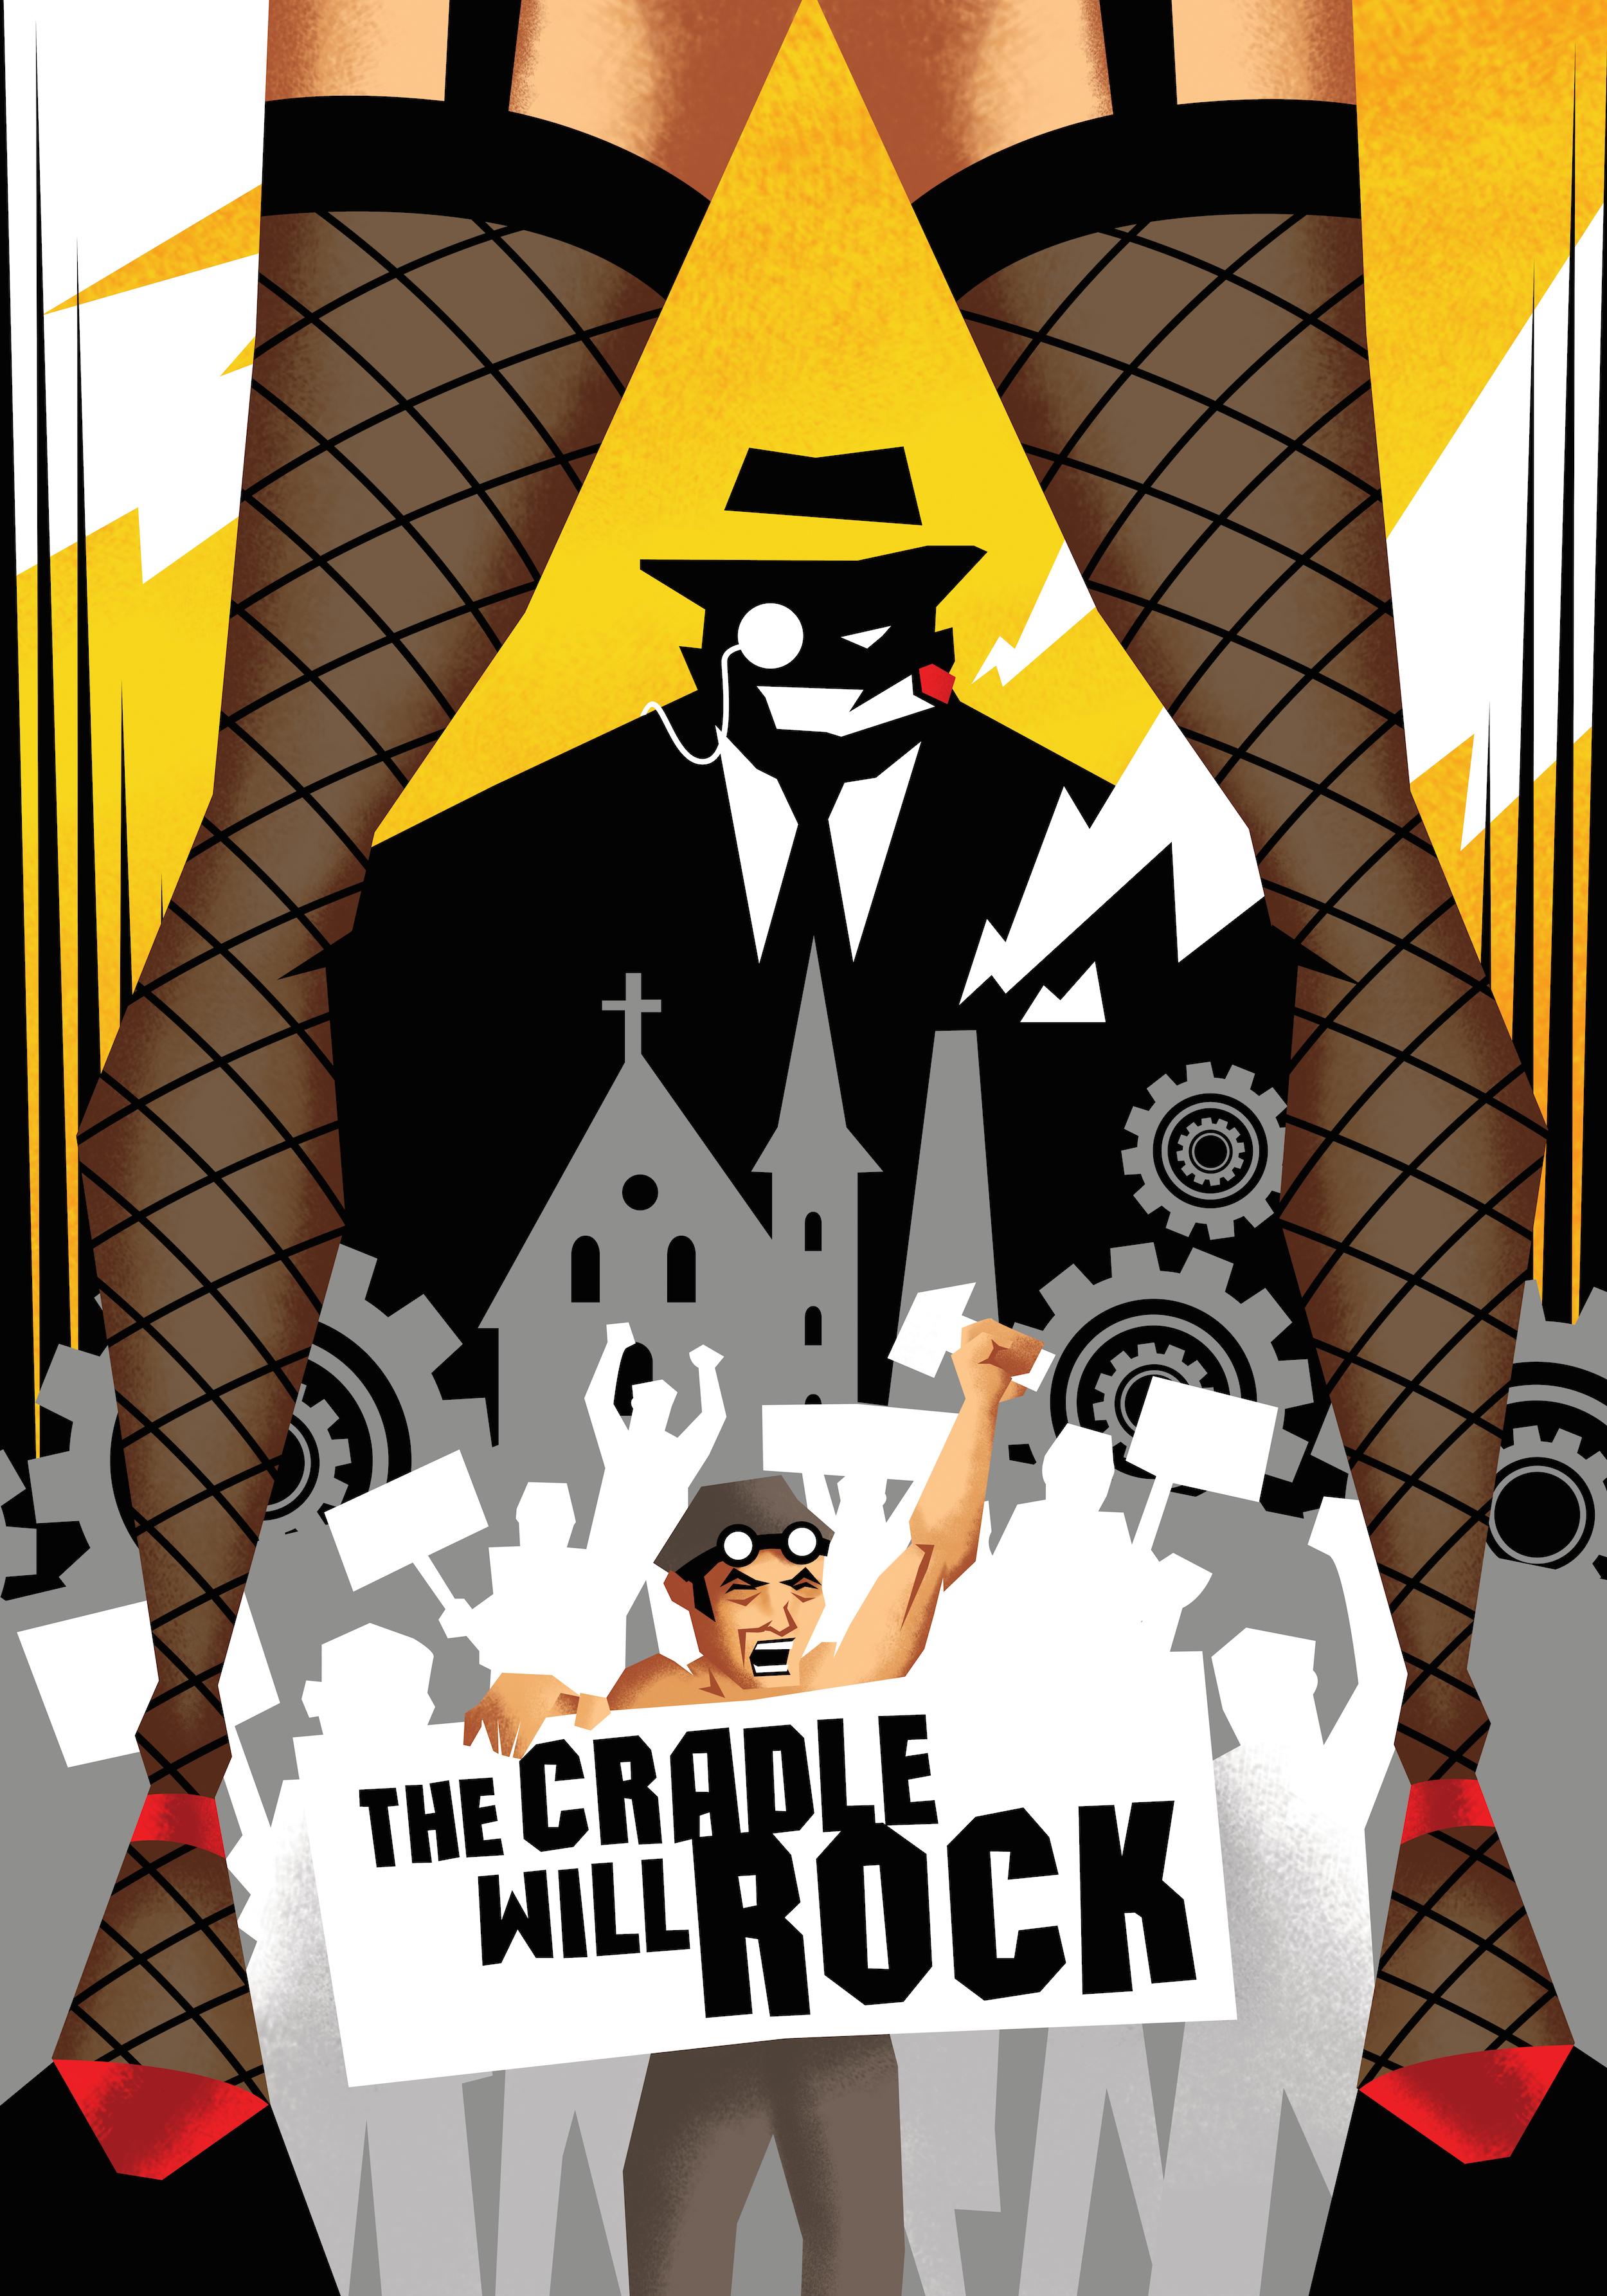 The Cradle Will Rock.jpg